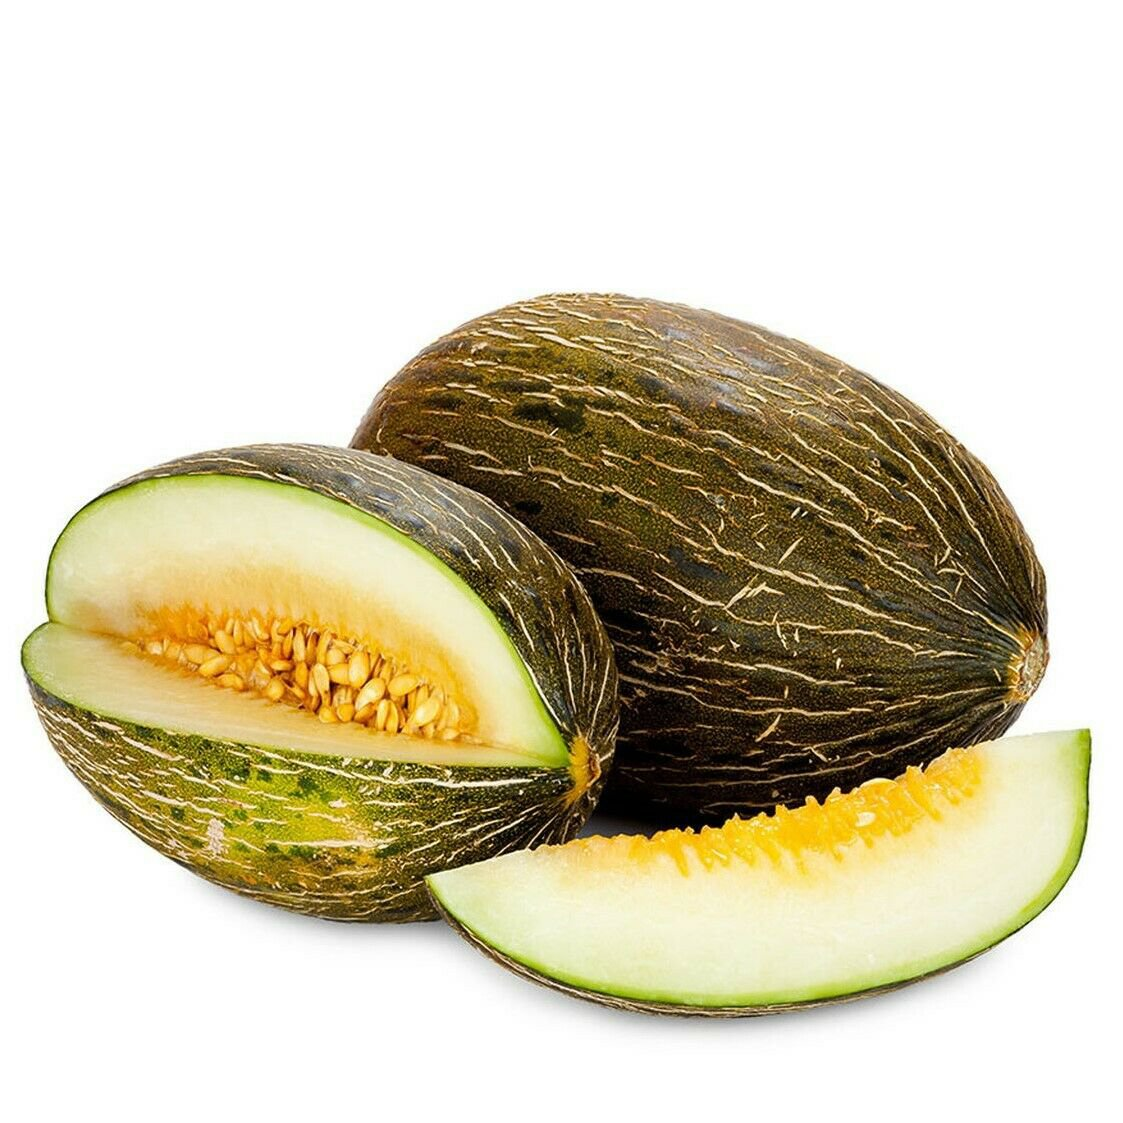 Rockmelon PIEL DE SAPO 10 Seeds